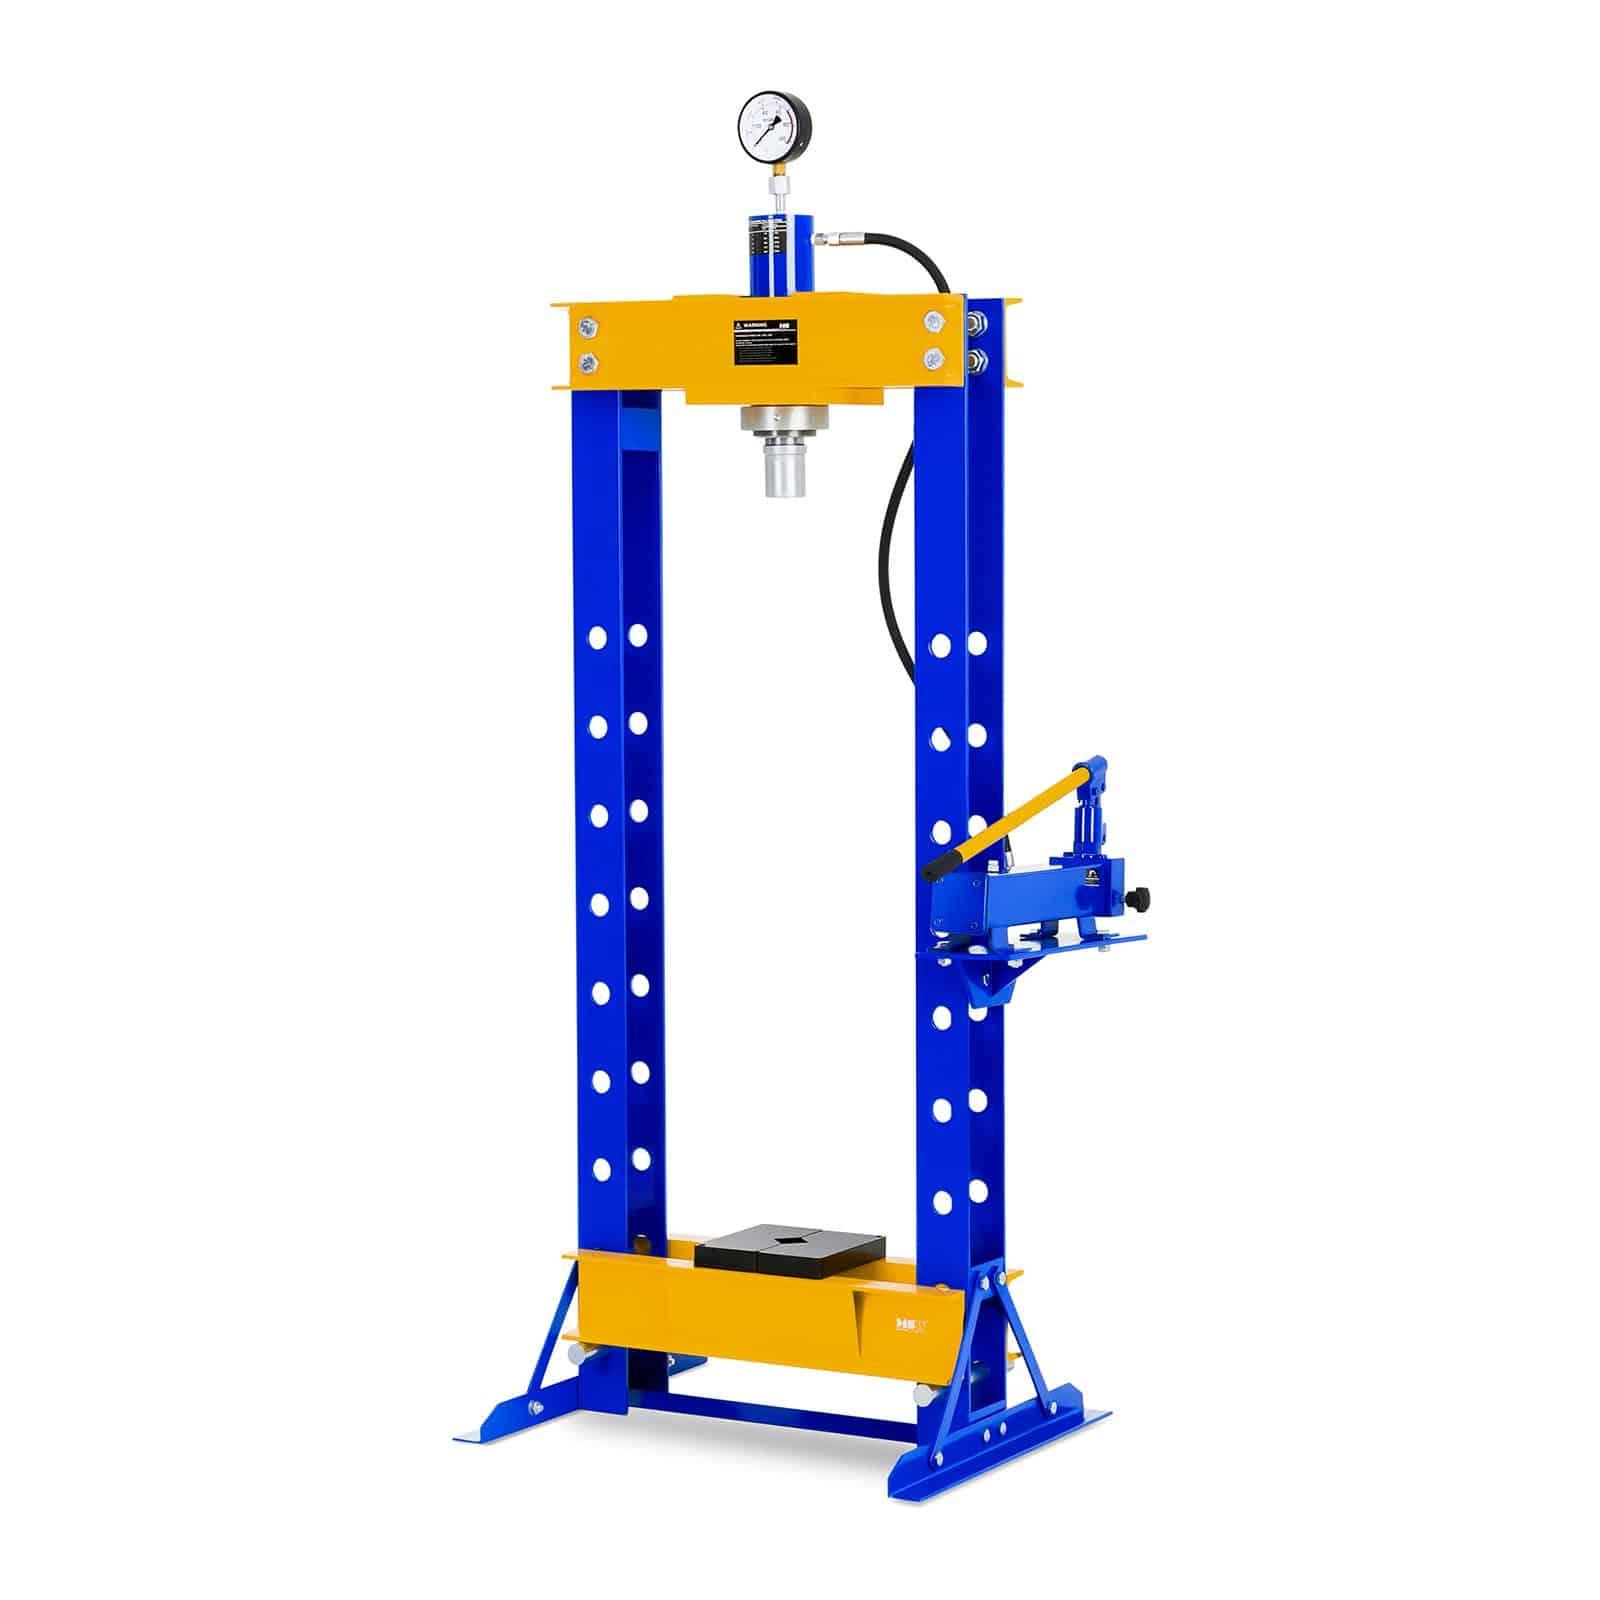 Prensa hidráulica de taller mecánico